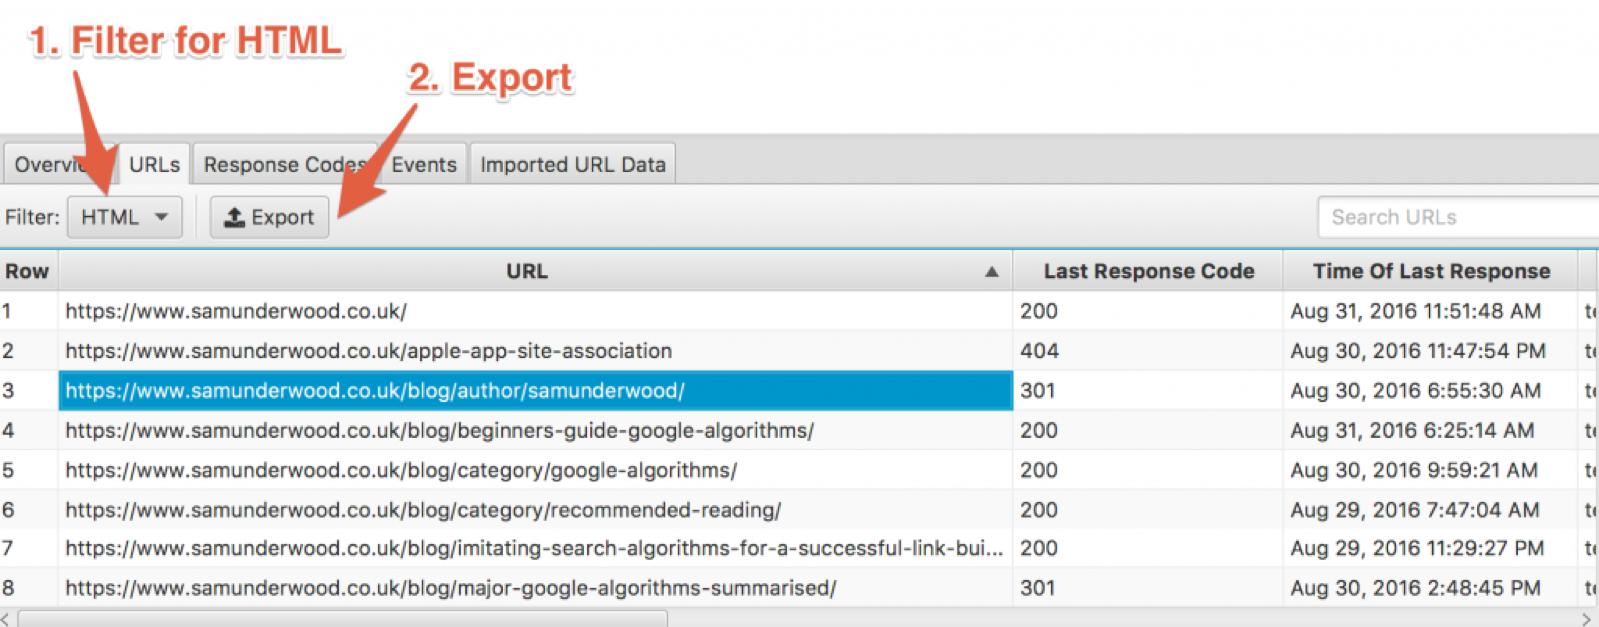 Filter for html